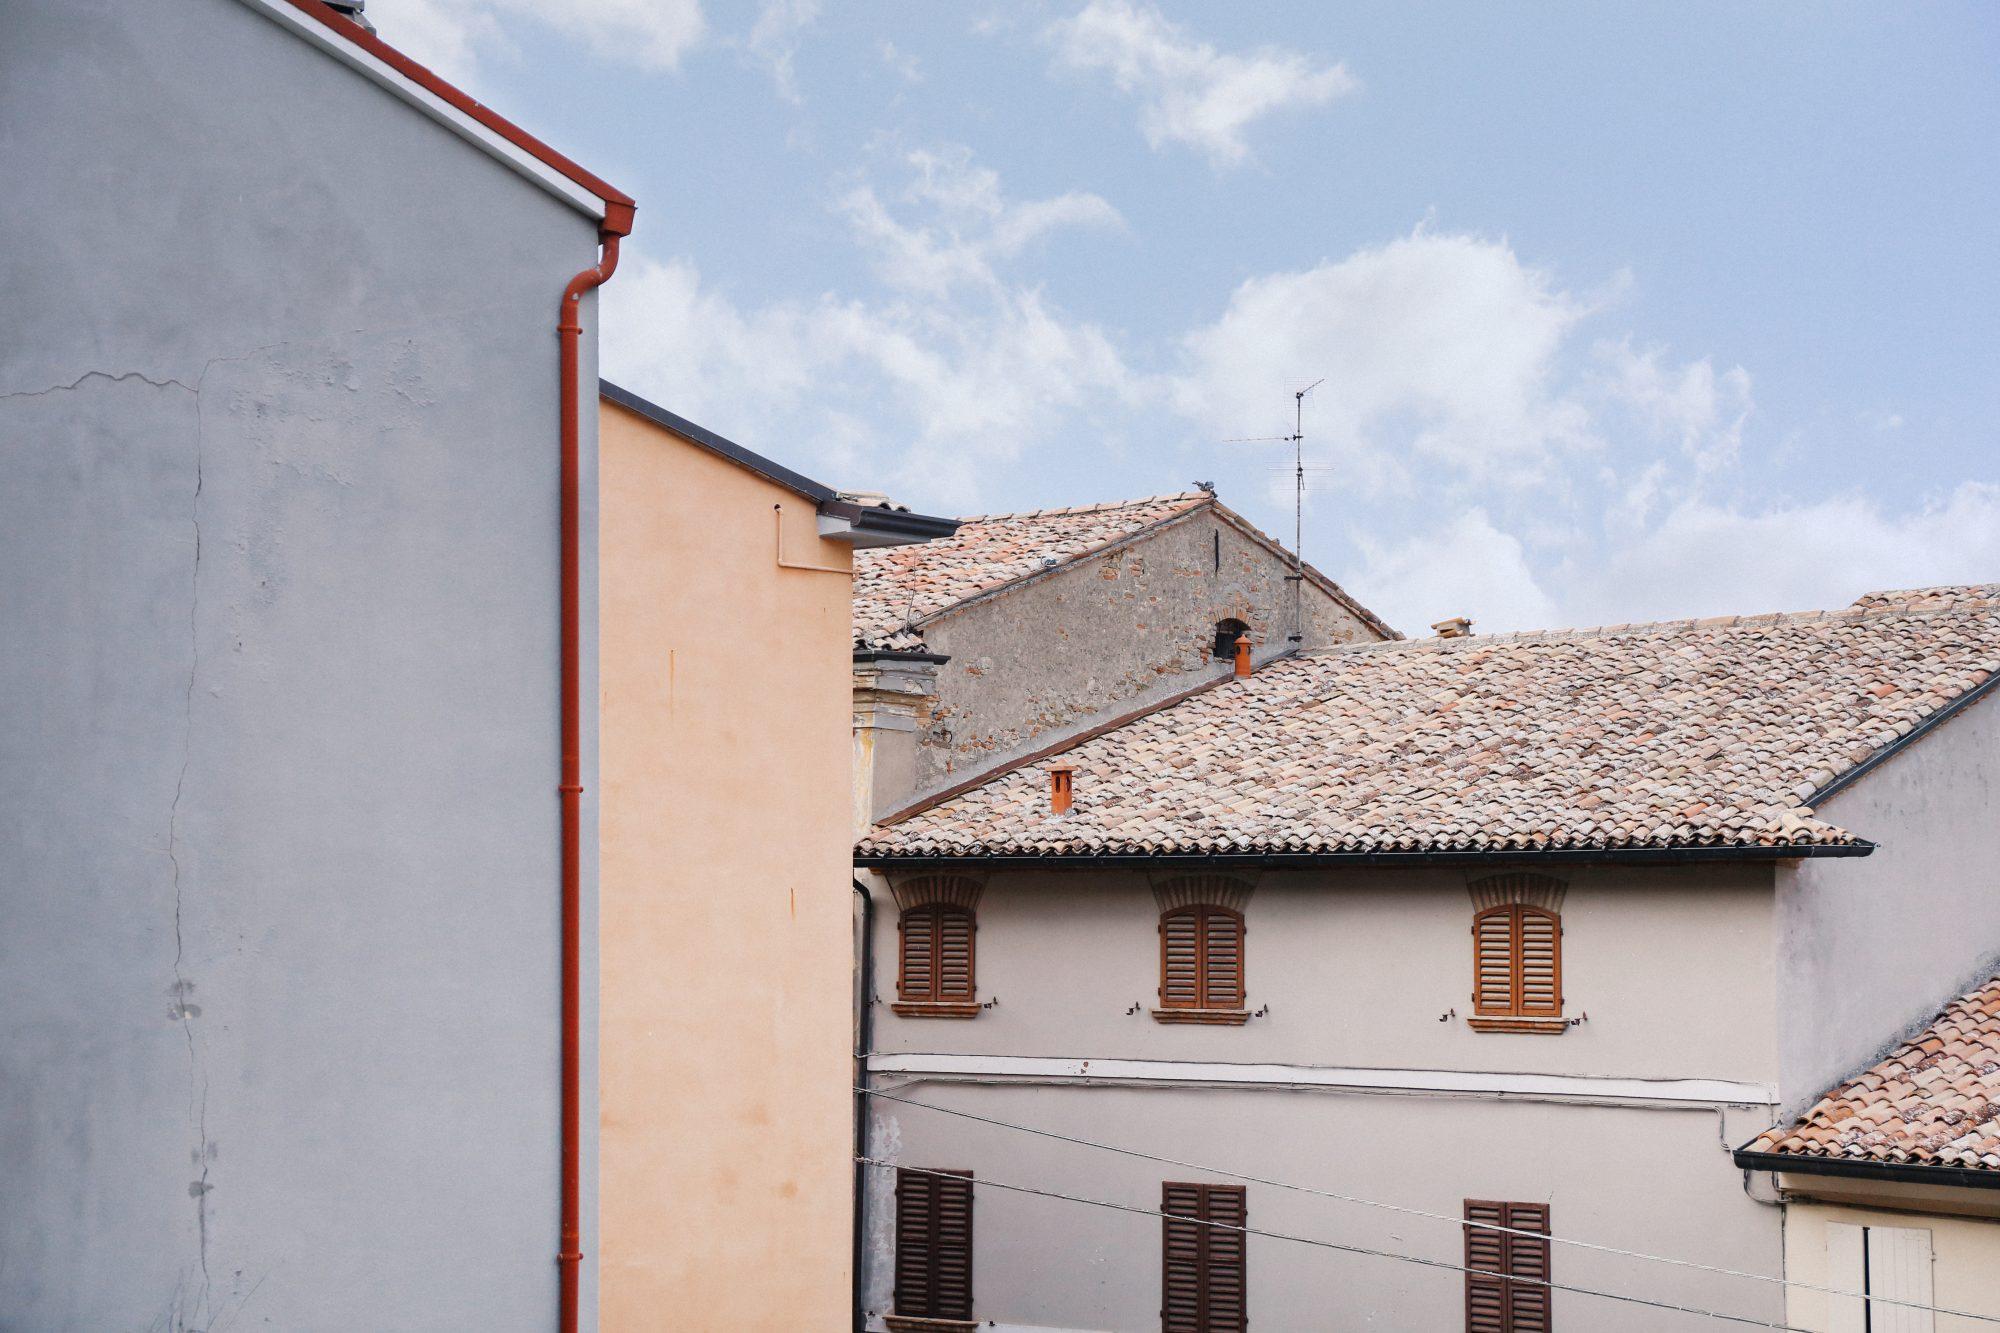 LandOutriders - Un weekend in Romagna con Pier Giulio Caivano | Collater.al 4